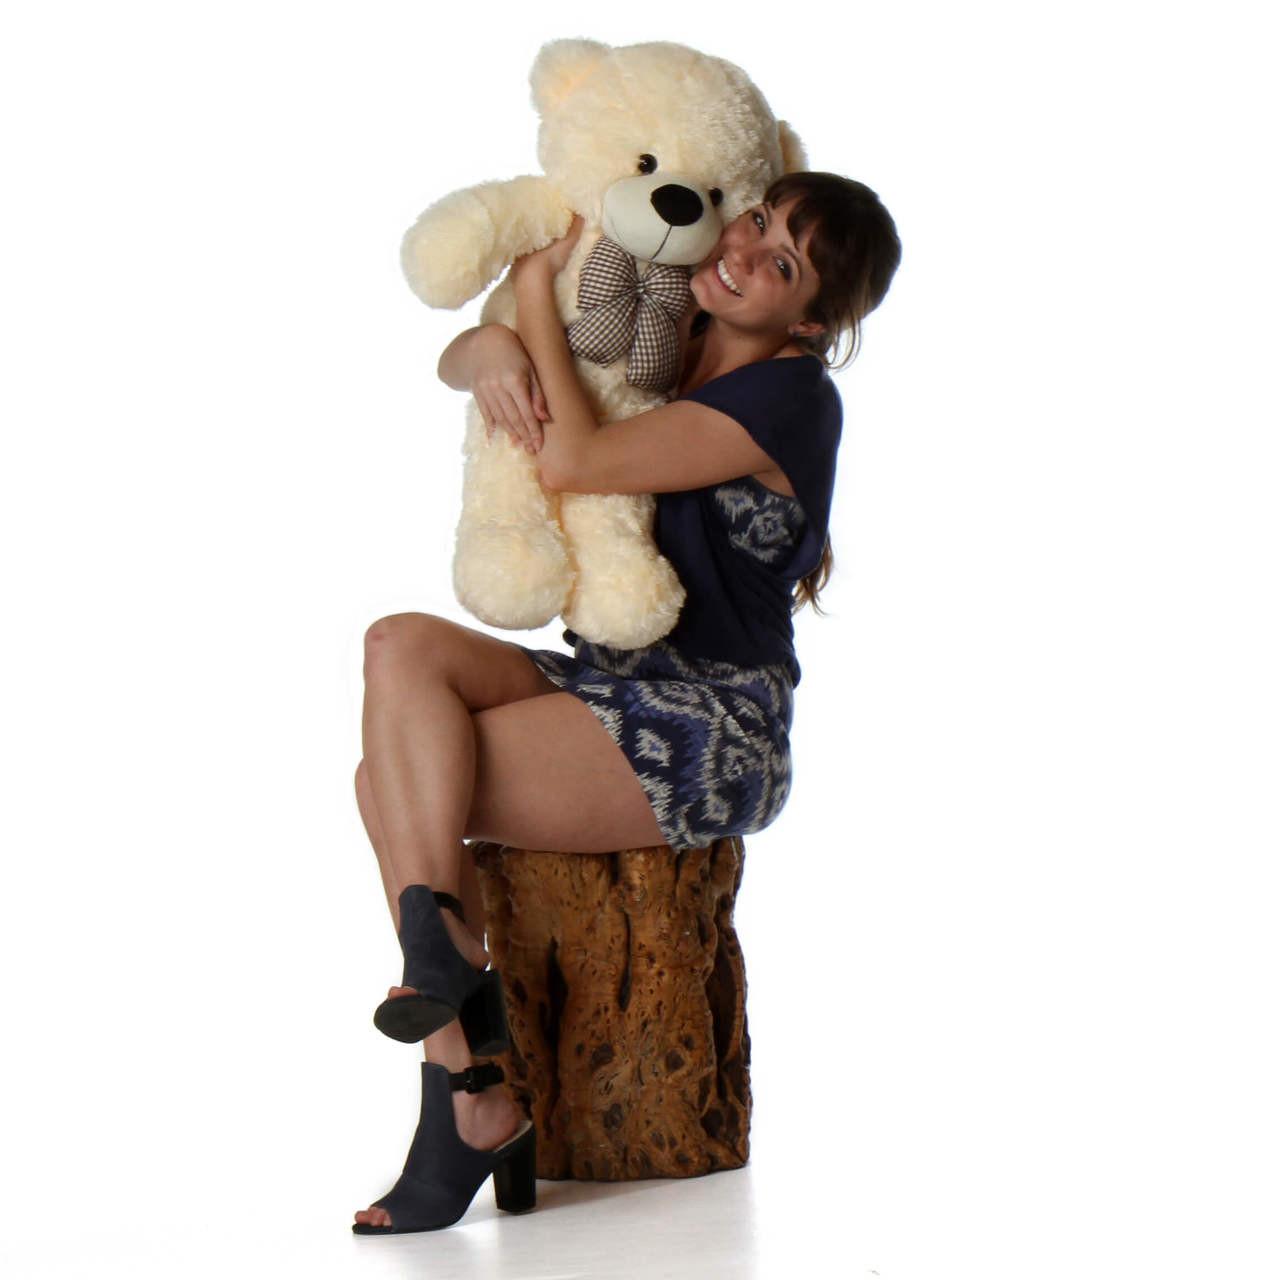 big teddy bear huge huggable soft huggable fur Cozy plush Cuddles from Giant Teddy